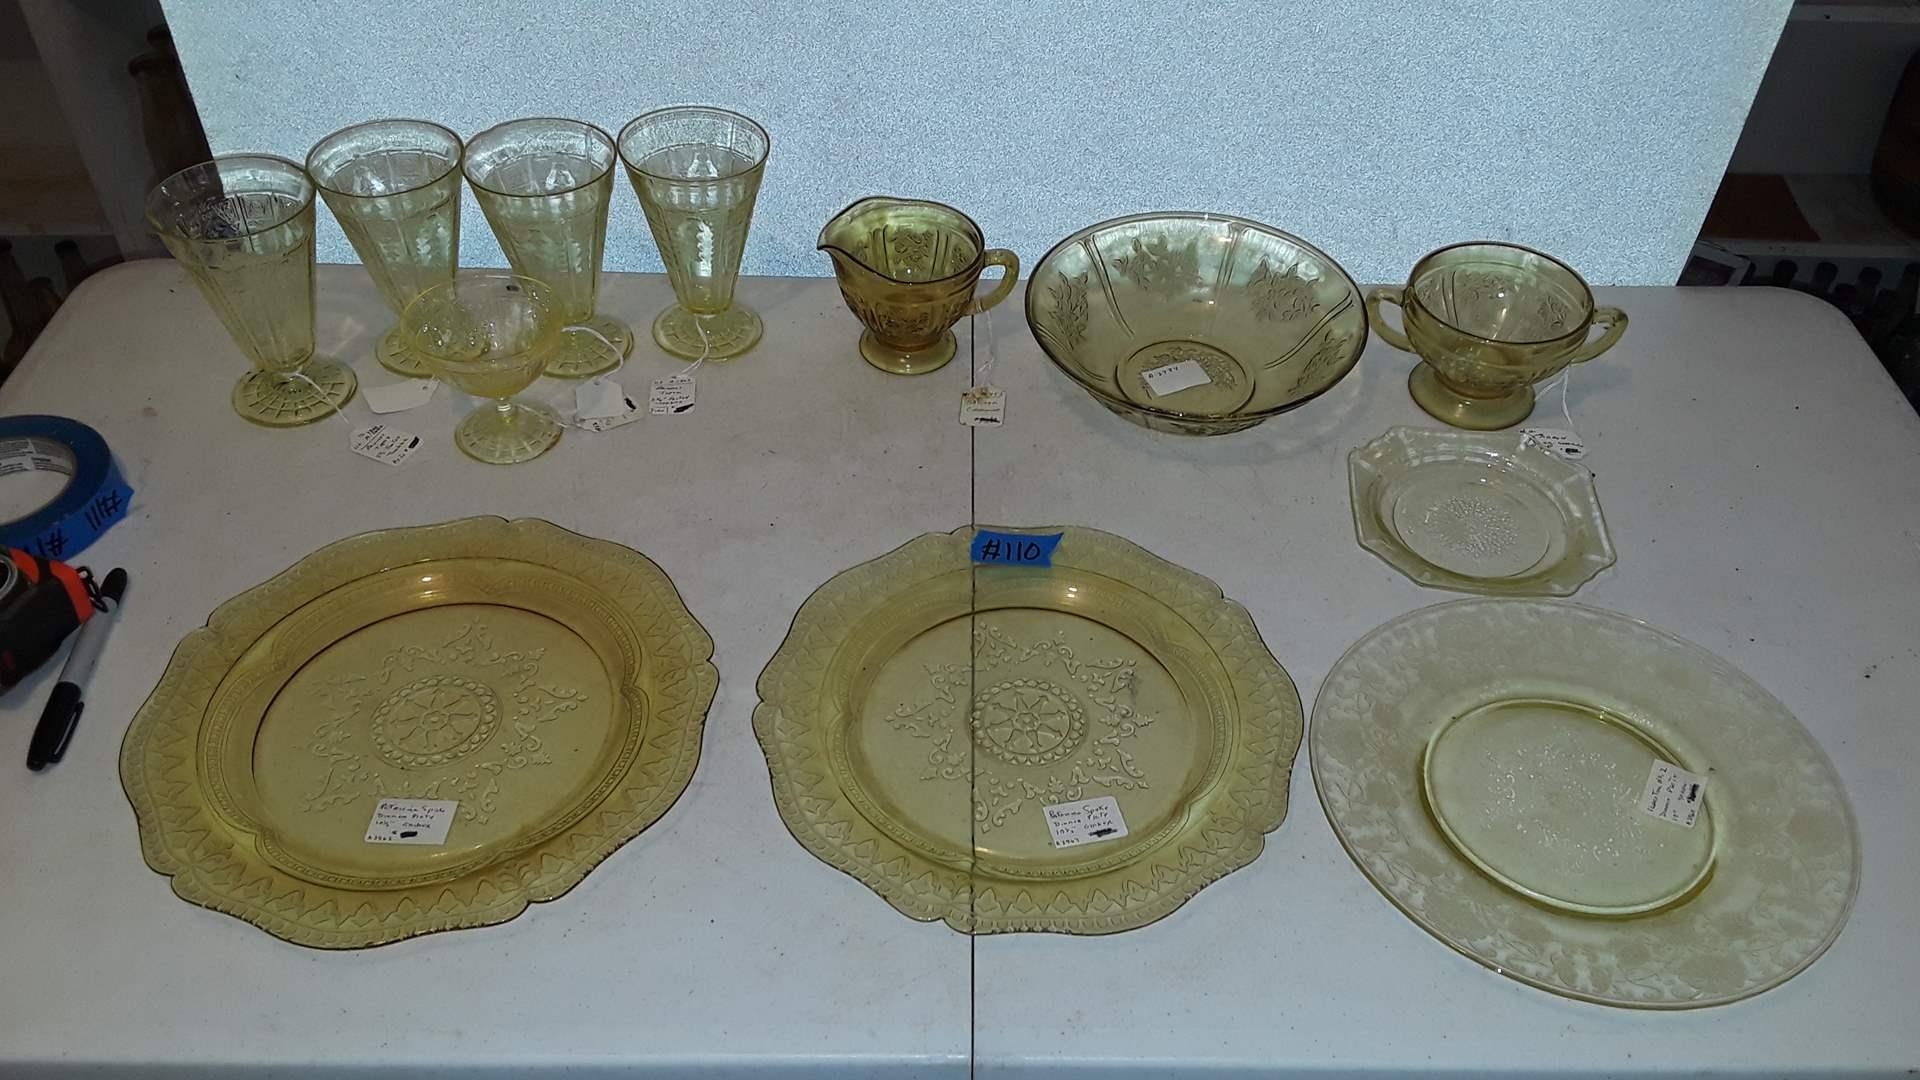 Lot # 110 ANTIQUE YELLOW DEPRESSION GLASS, PATRICIAN SPOKE, FLORENTINE, PRINCESS TOPAZ, SHARON